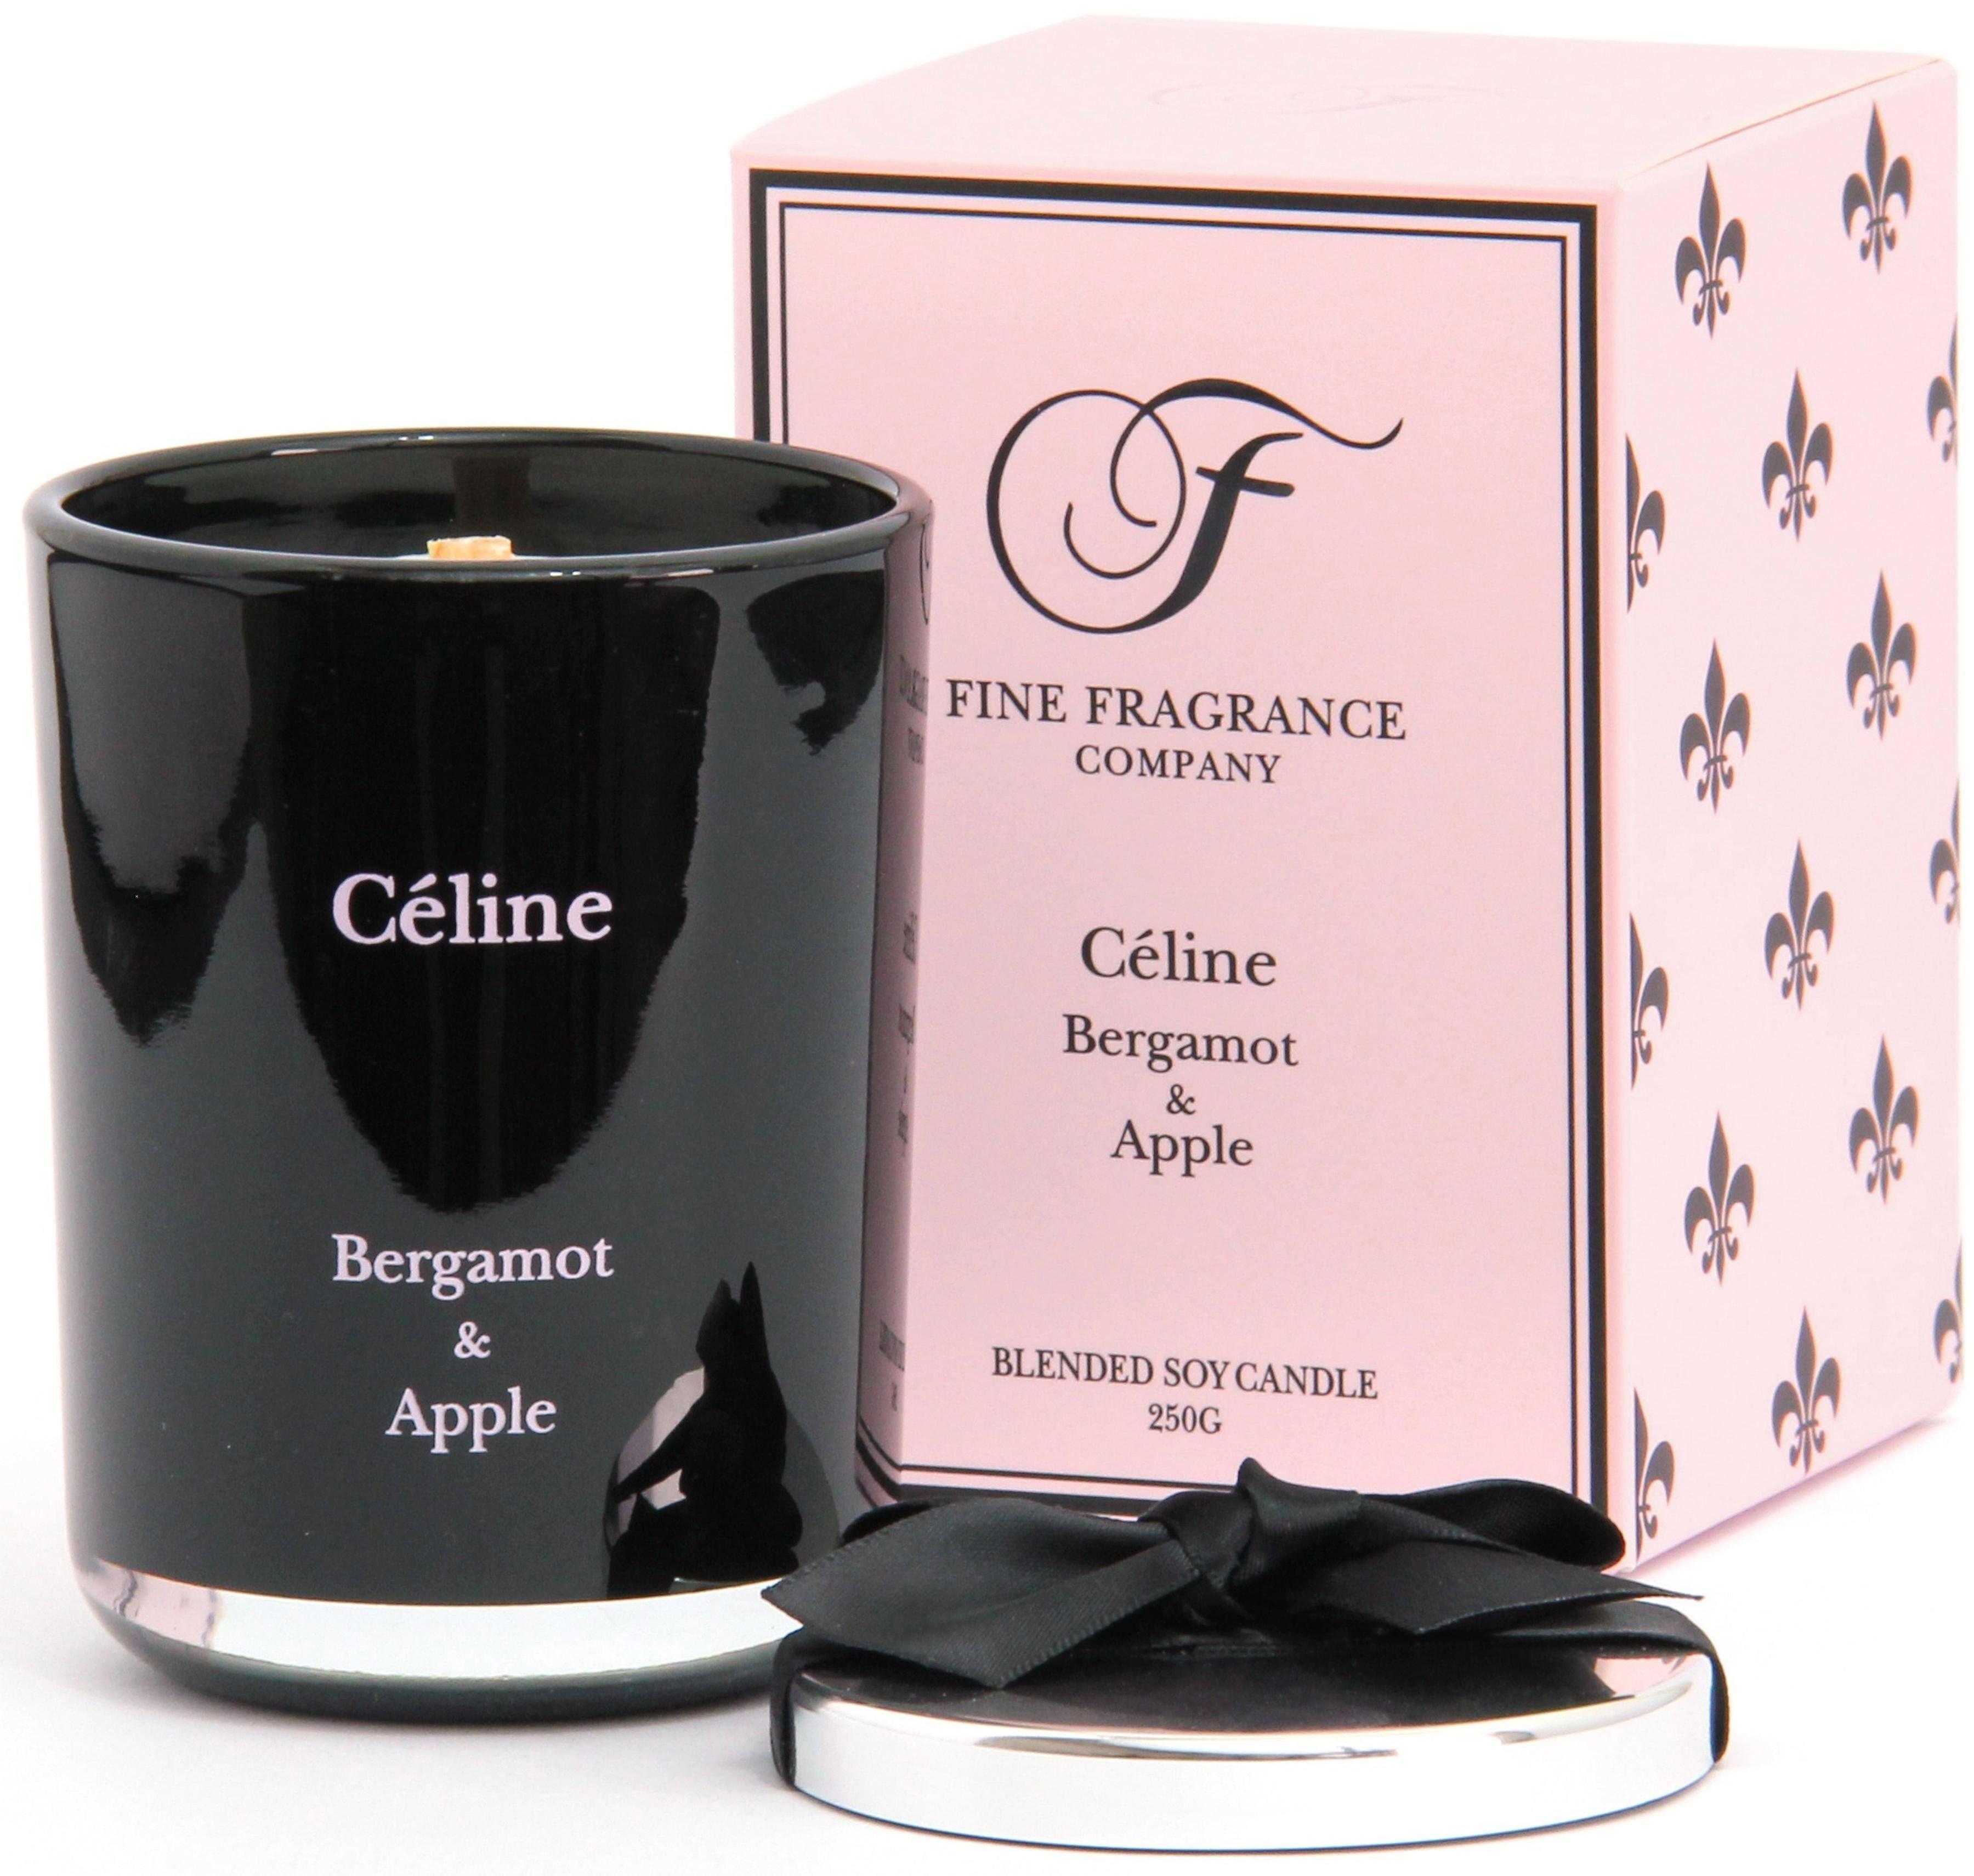 Fine Fragrance Company Duftkerze, »Paris-Chic - Celine«